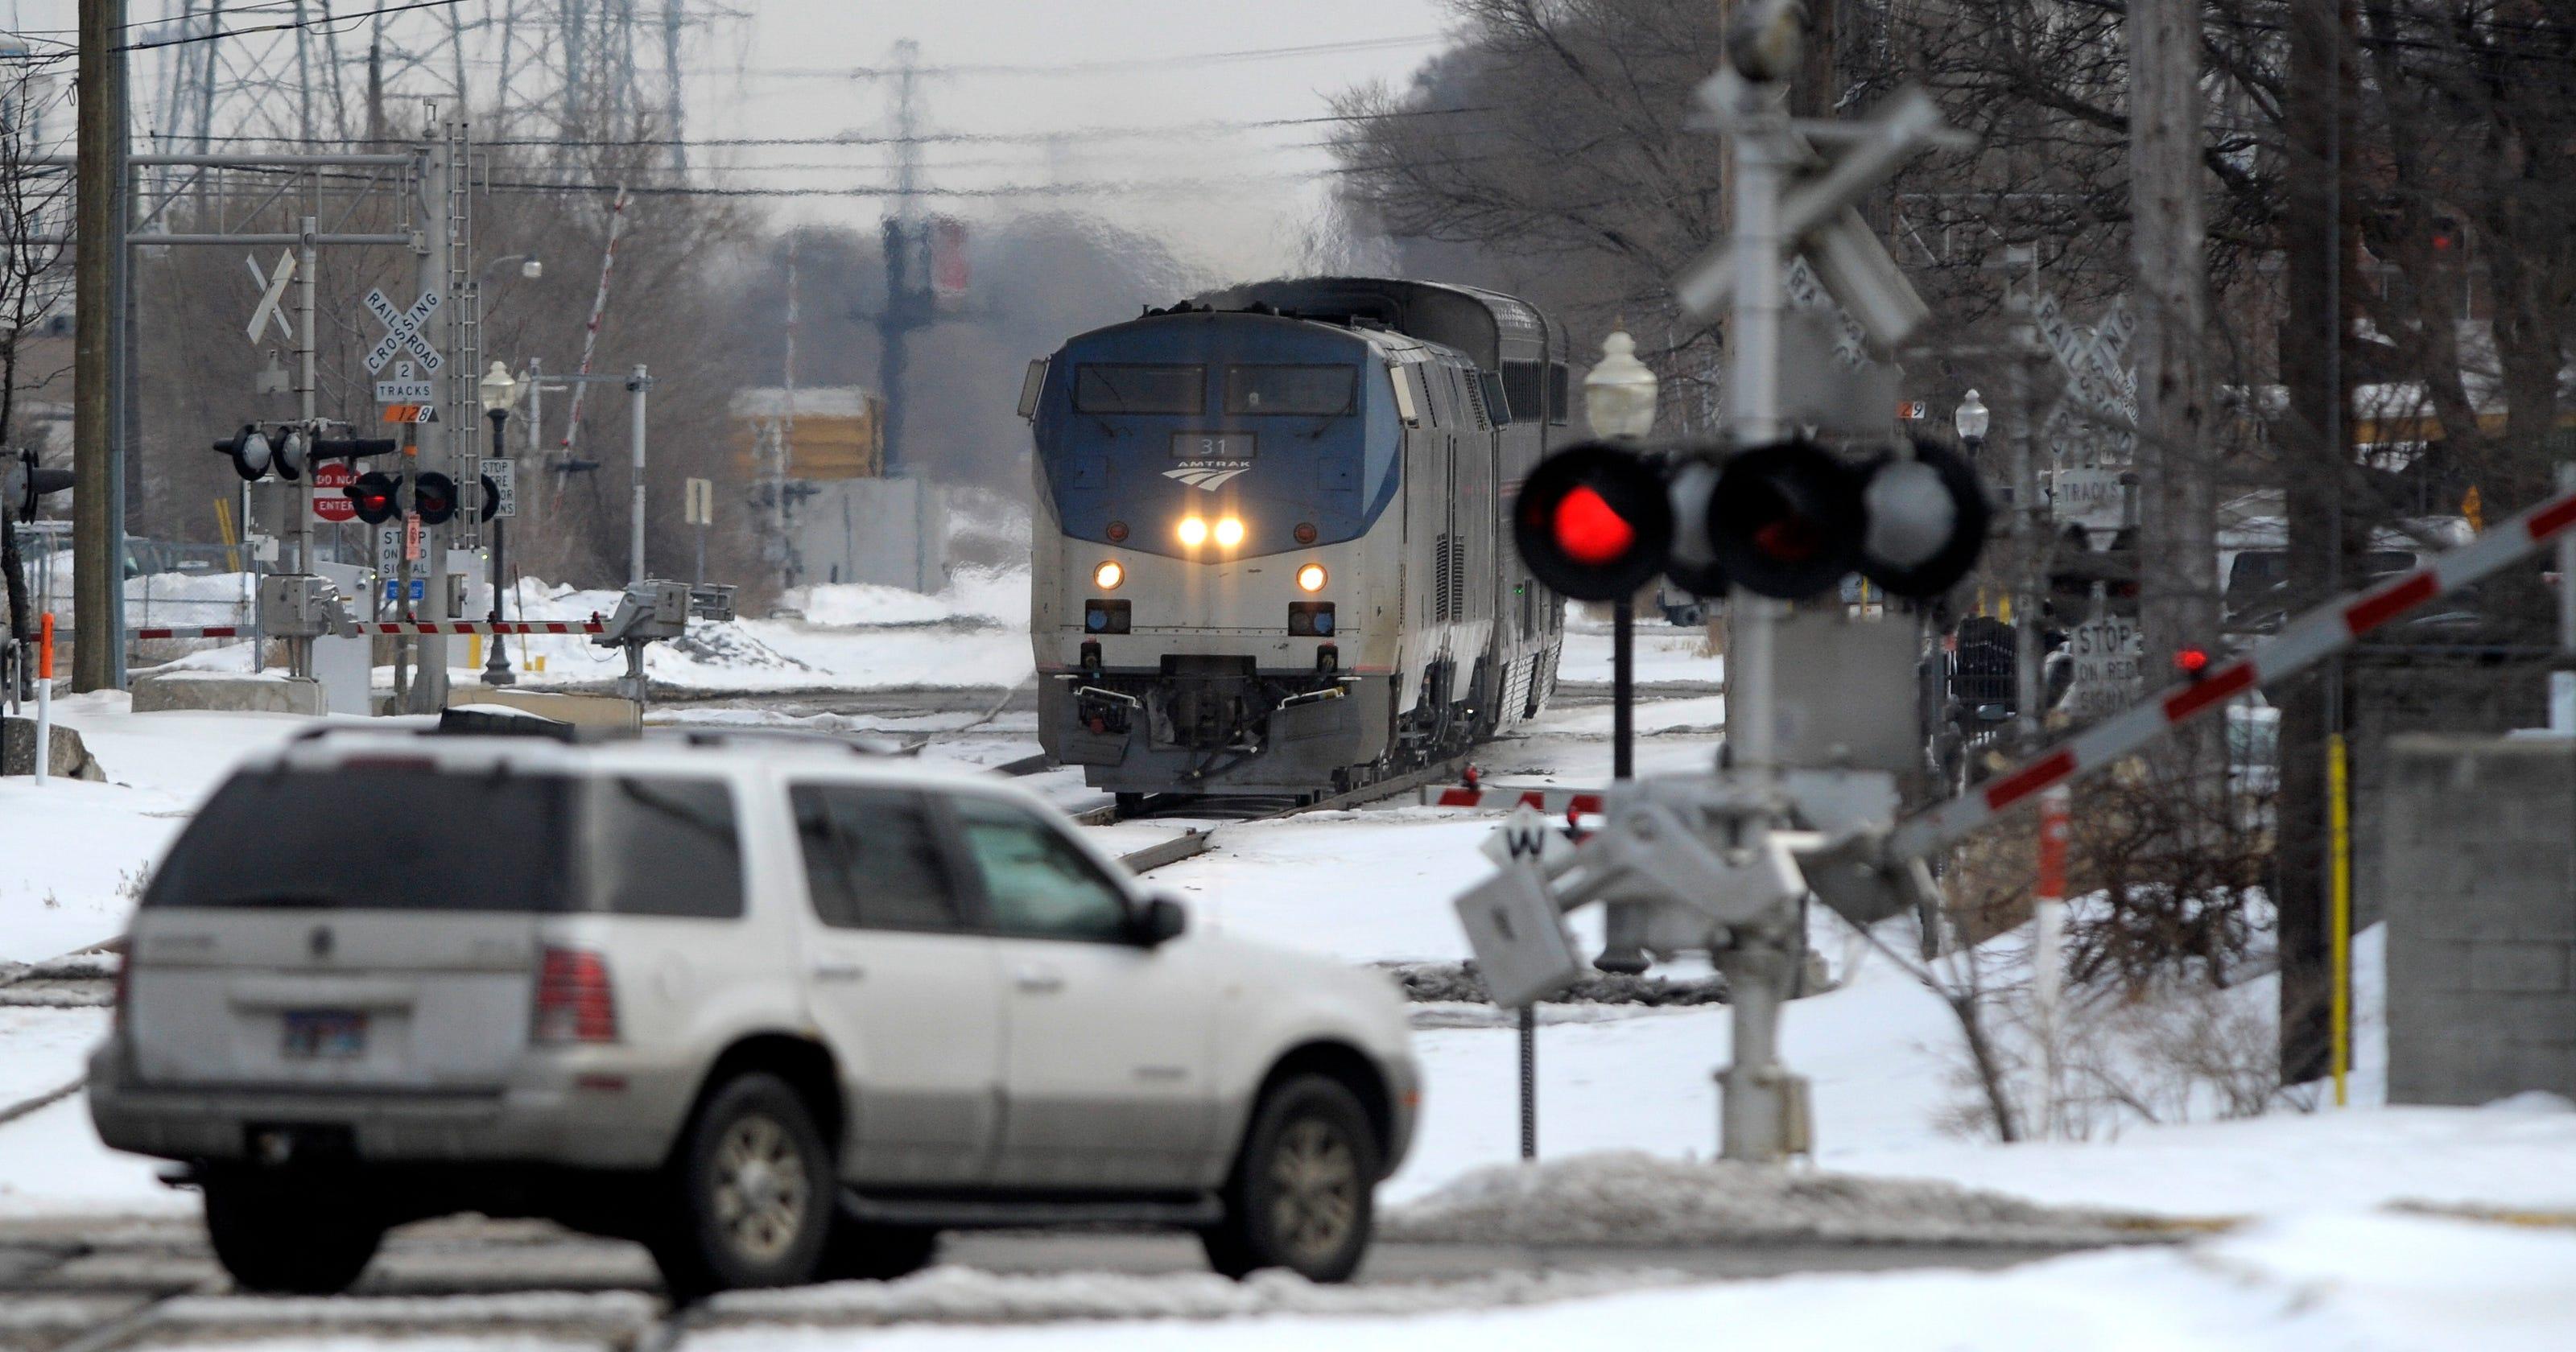 Michigan train-car crashes rising